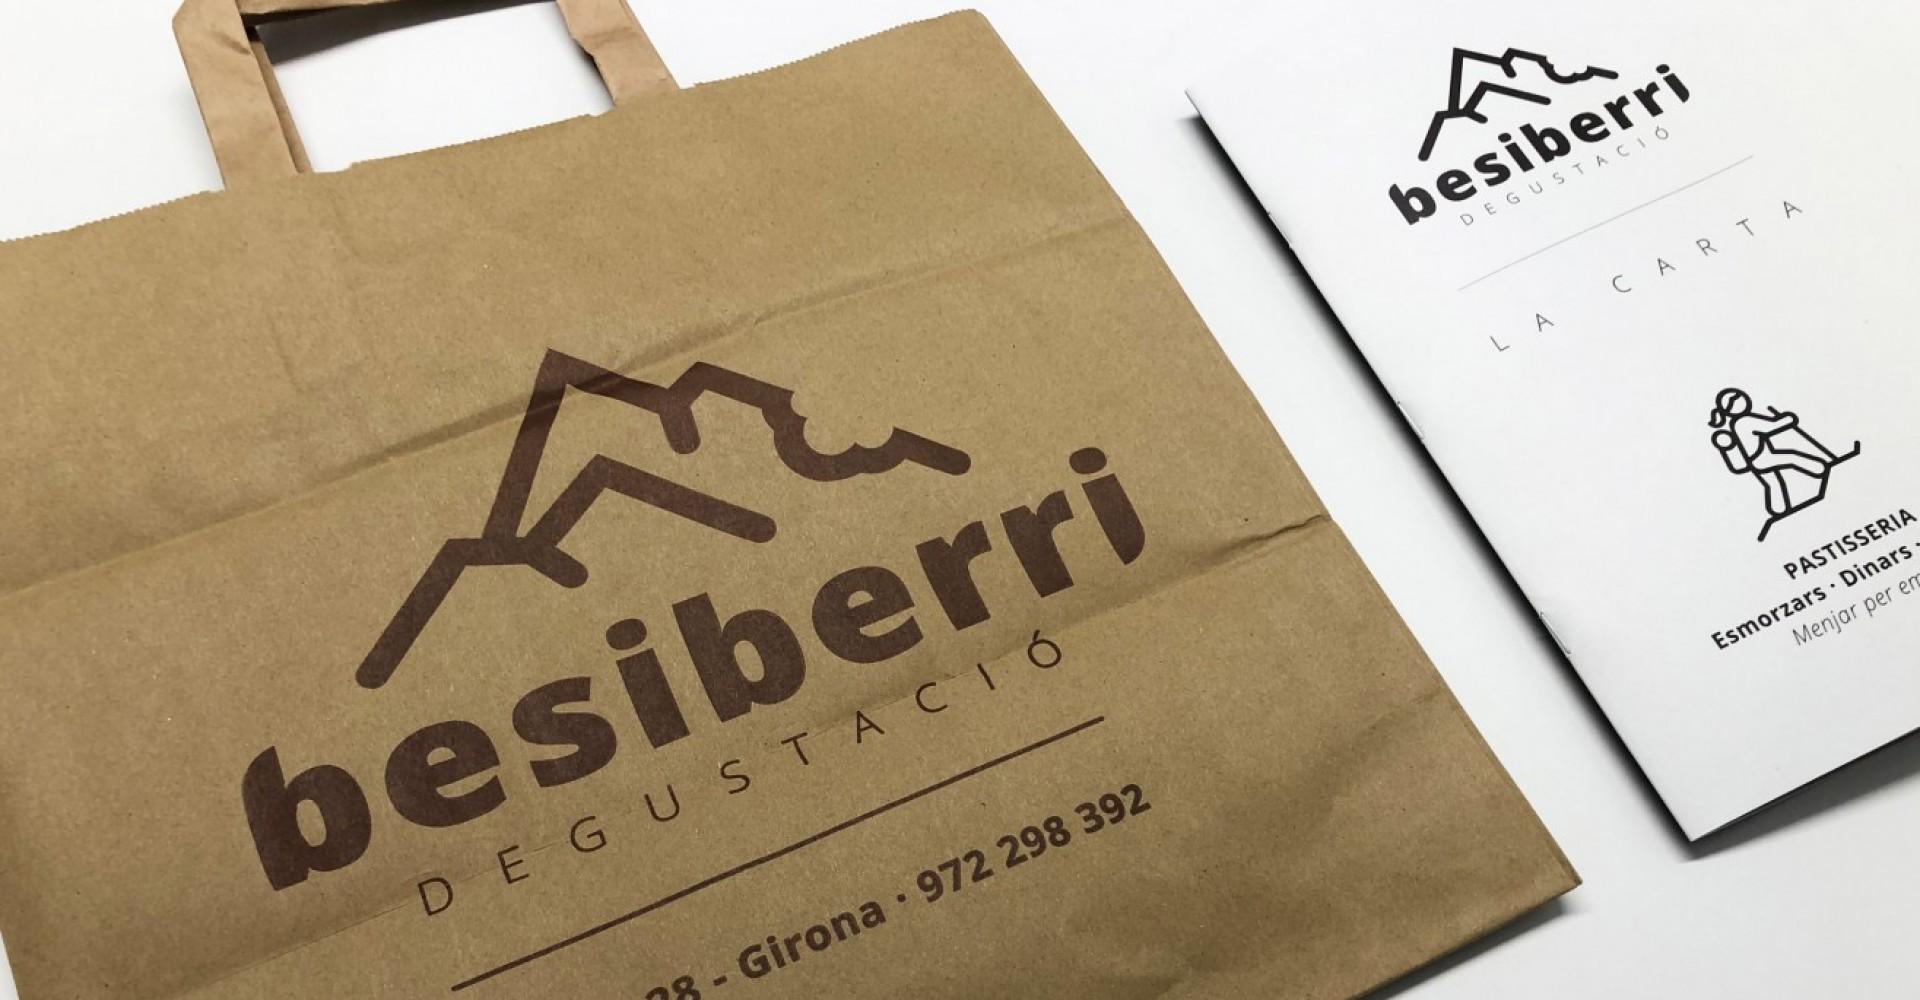 Besiberri Degustació